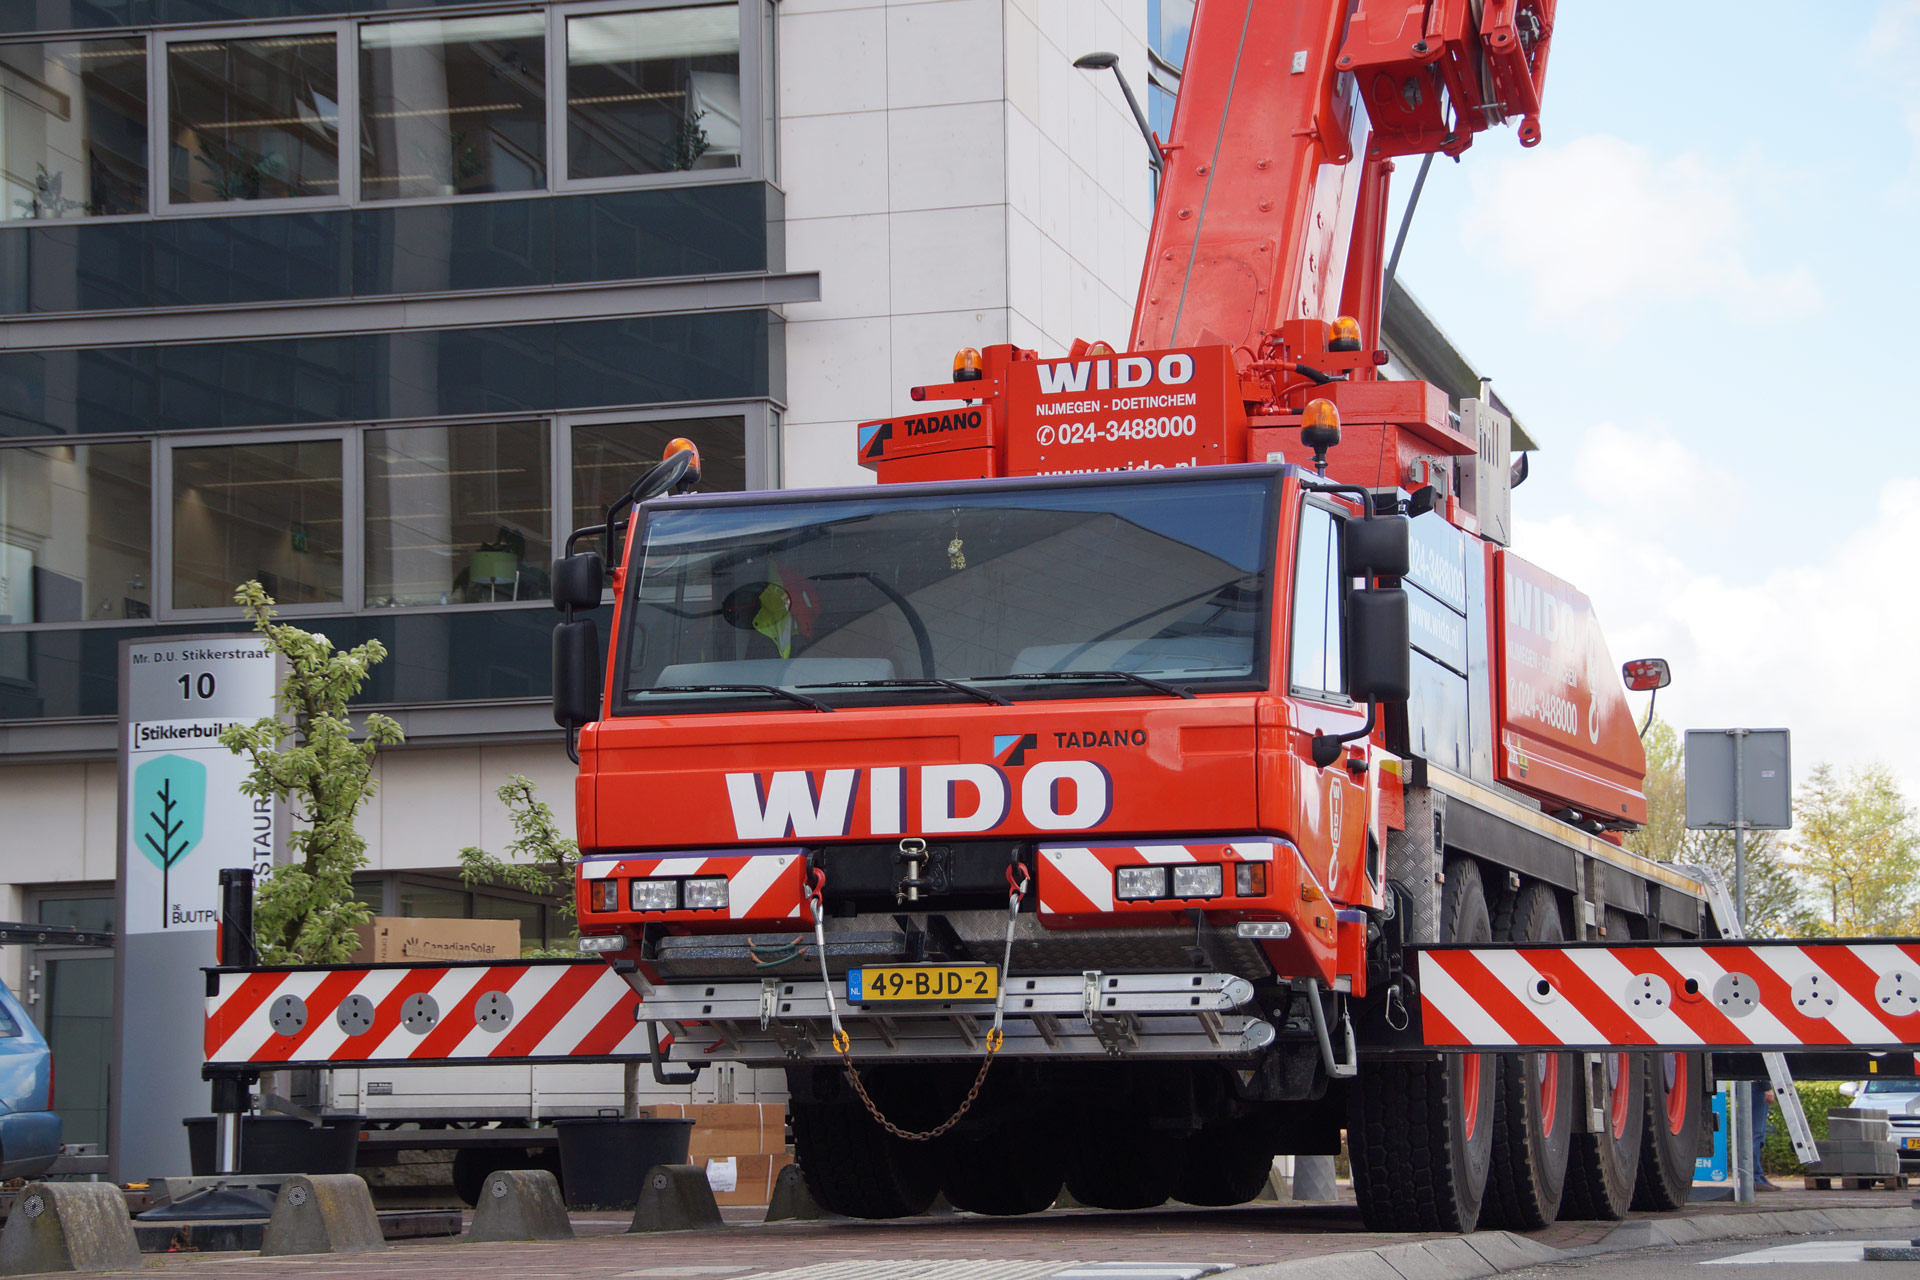 WIDO foto